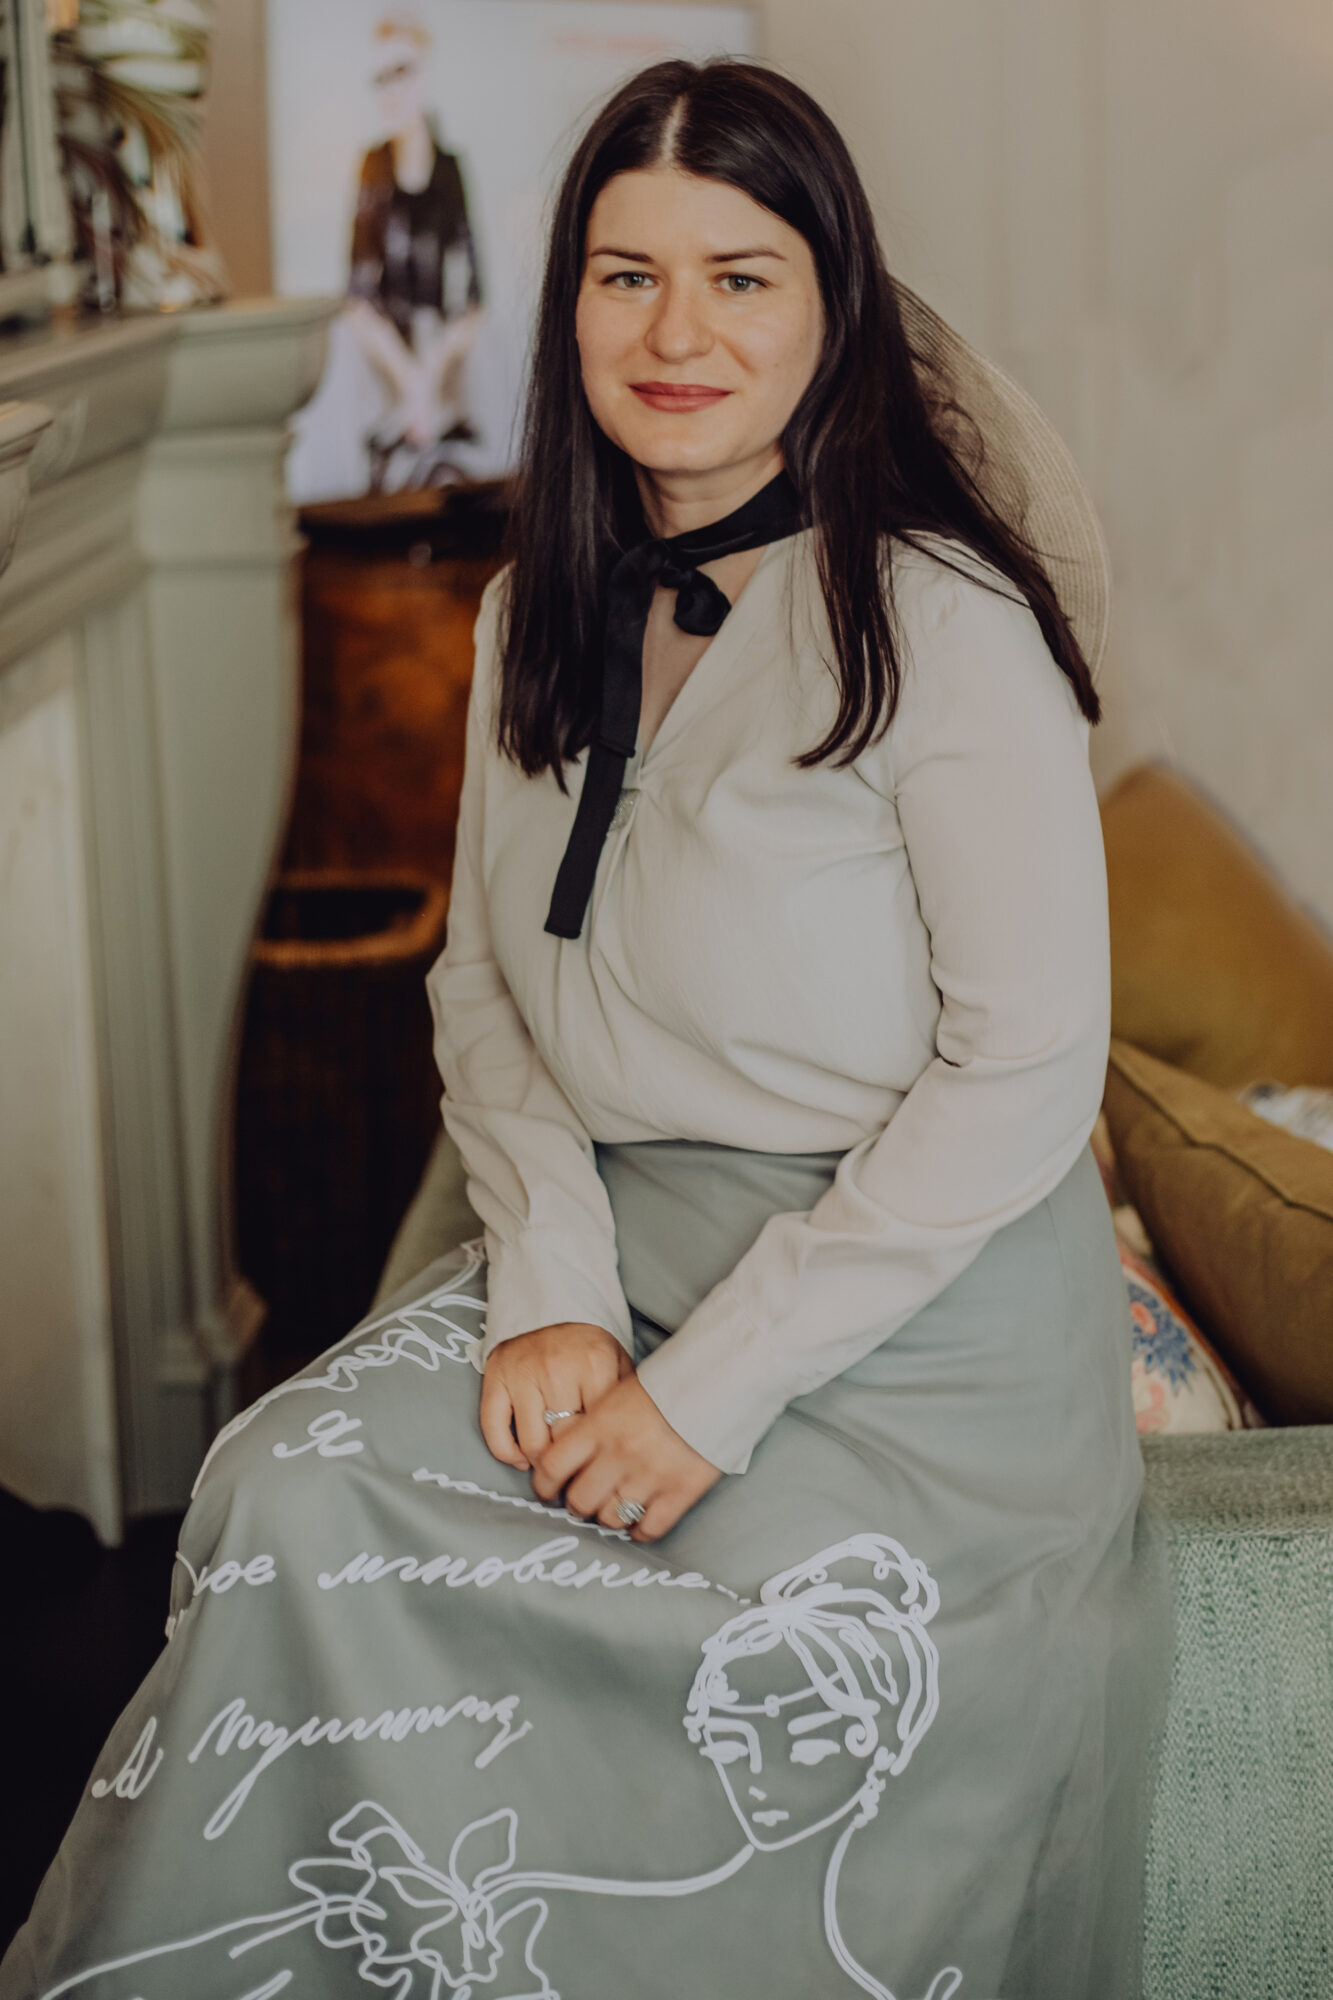 Светлана Лондон на мероприятии Women Who Inspire в Лондоне. Photography: Victoria Maze